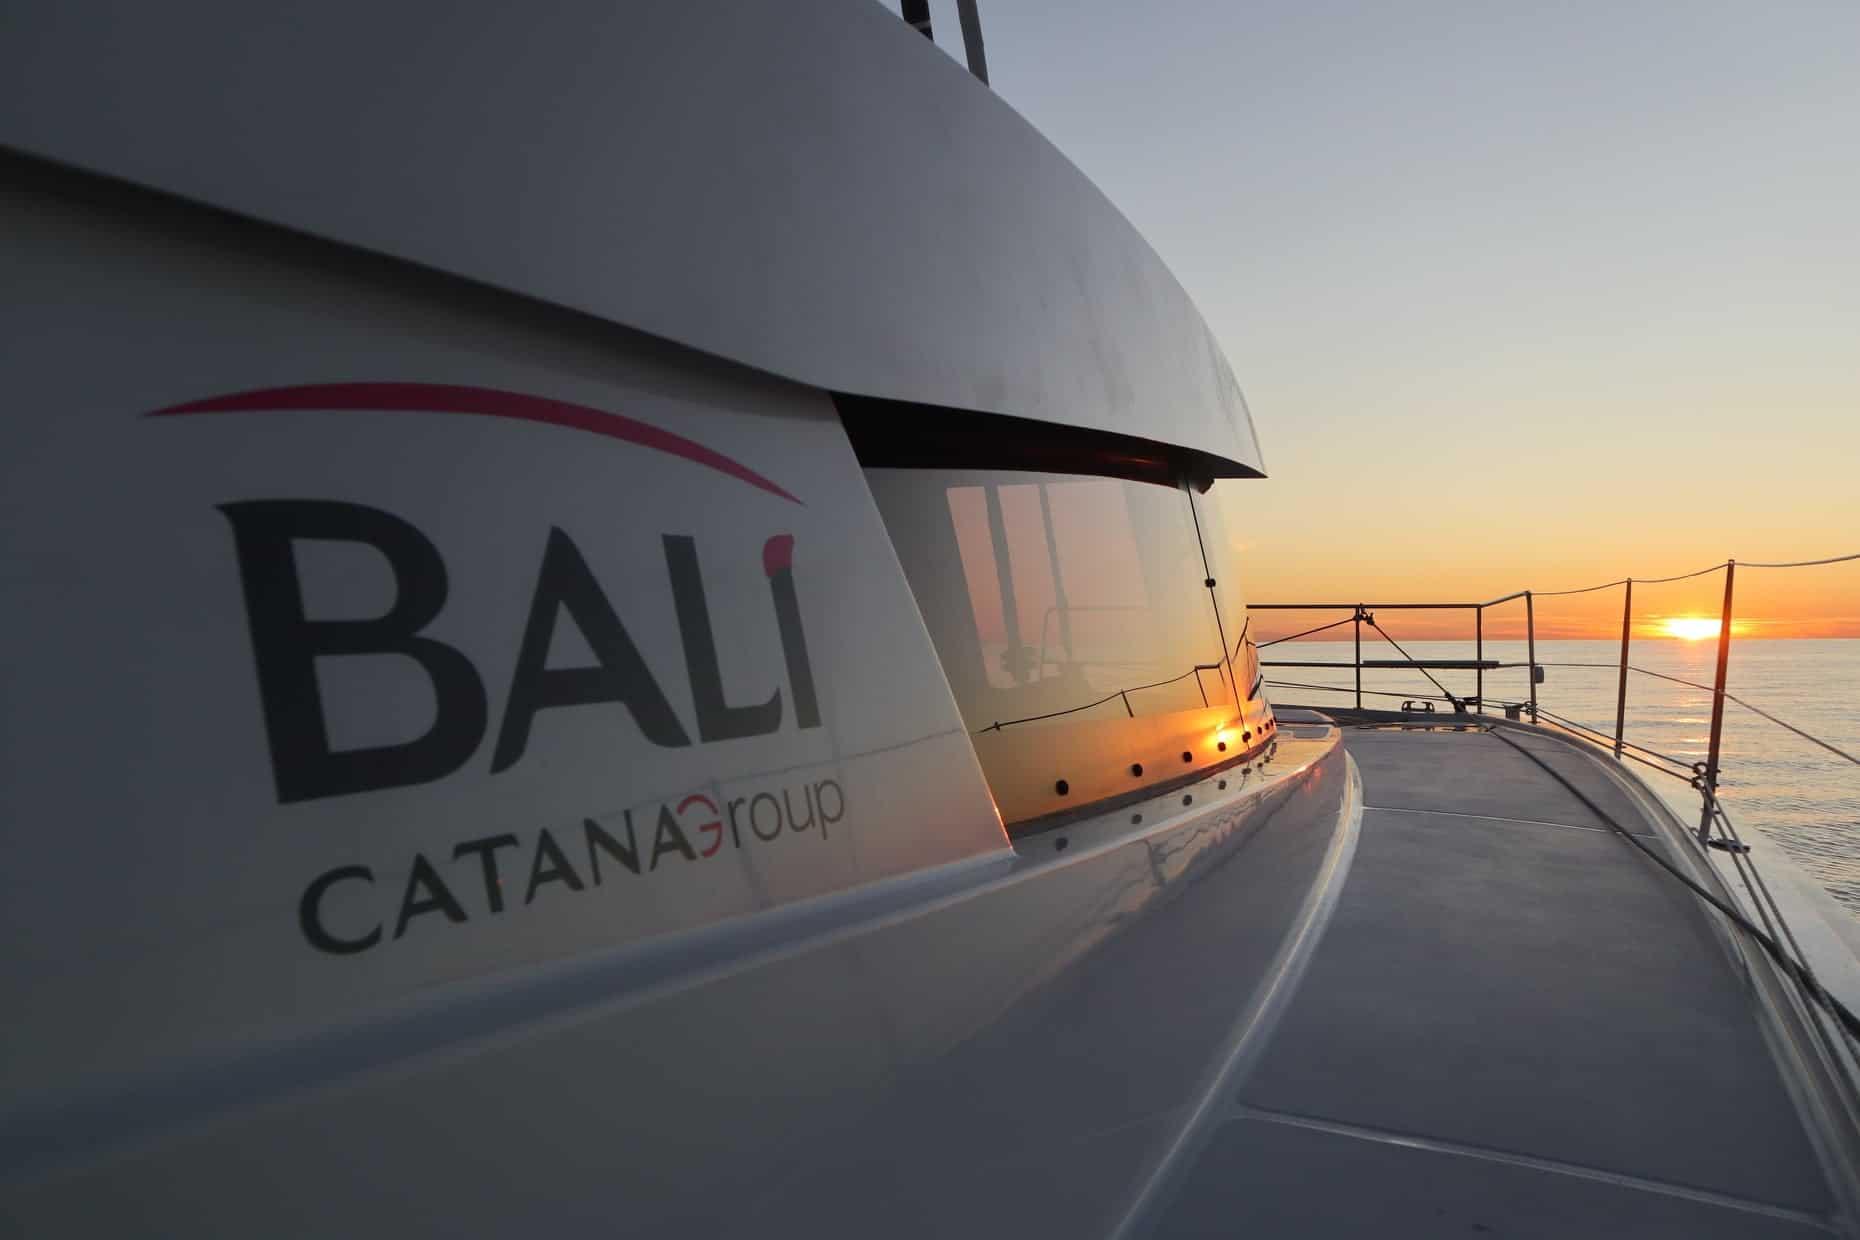 bali 5.4 catamaran named z3 near spain